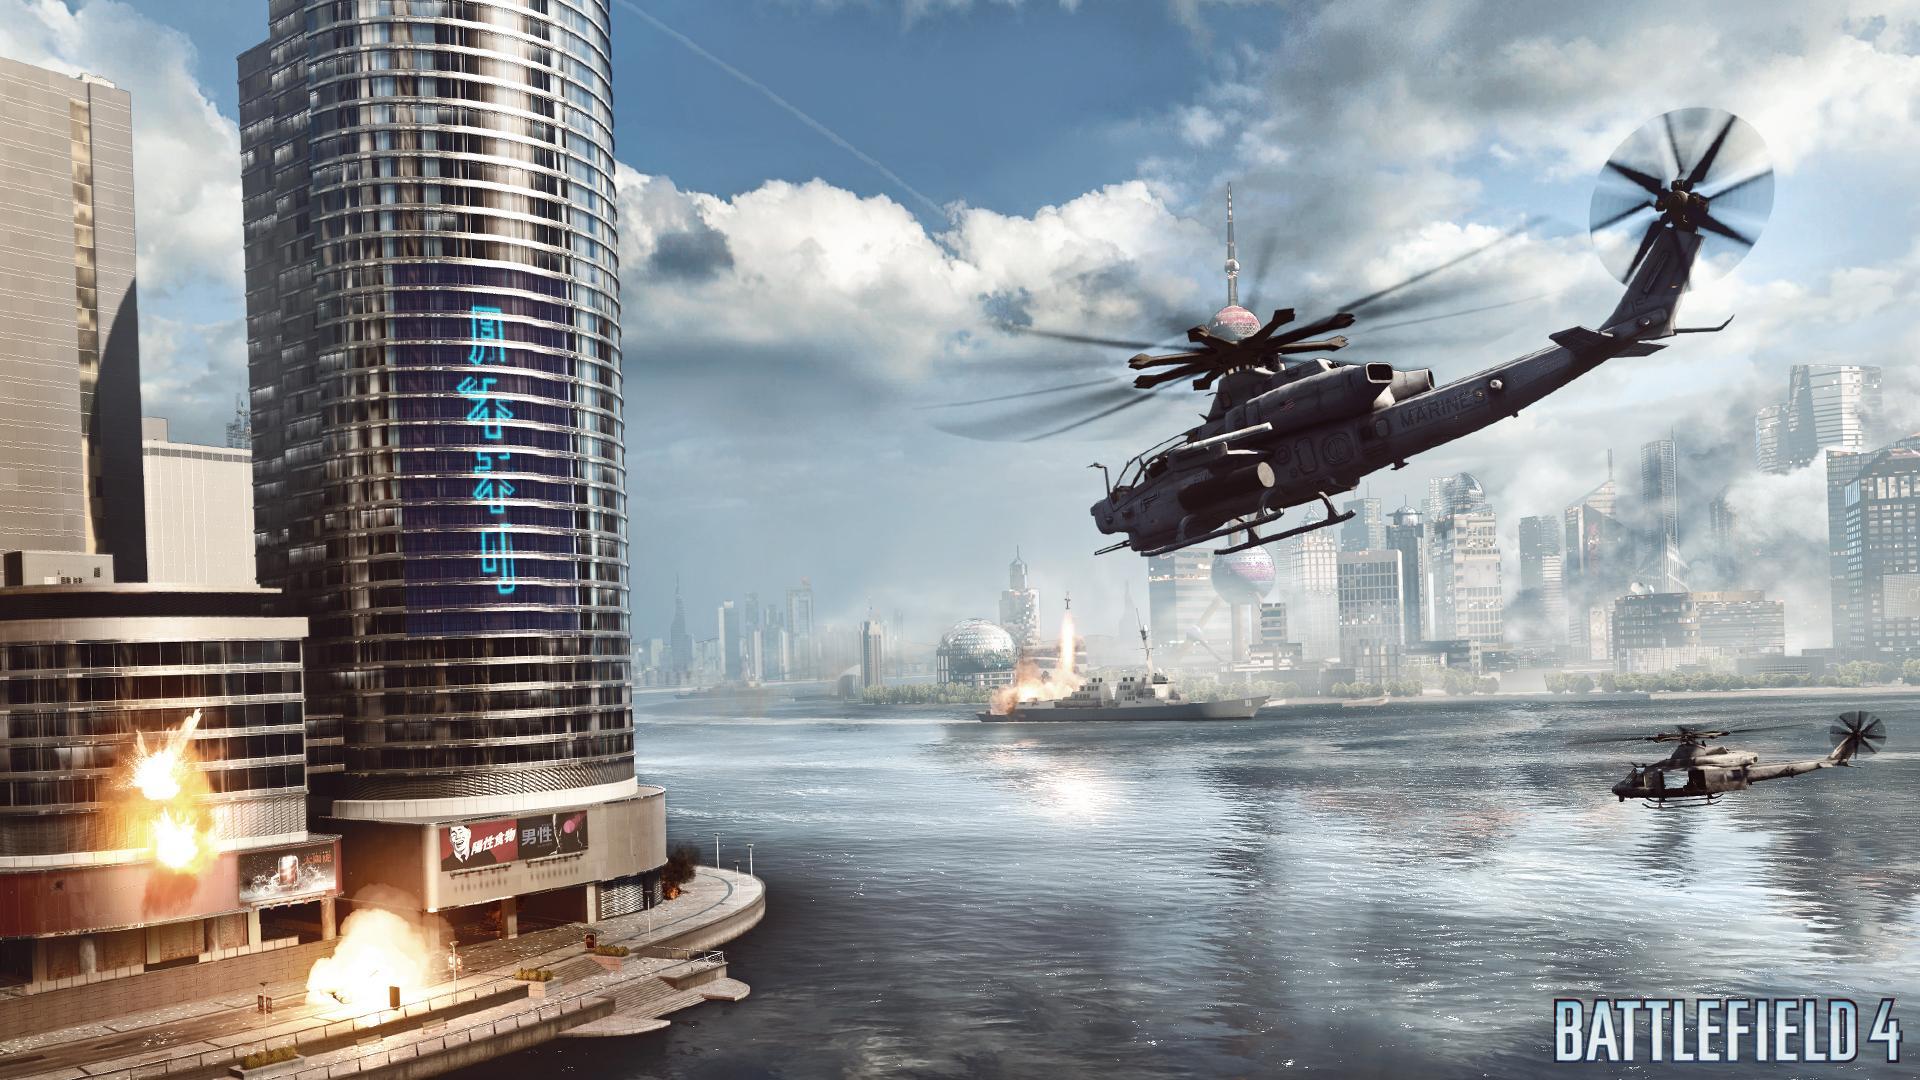 Battlefield 4 wallpaper 15